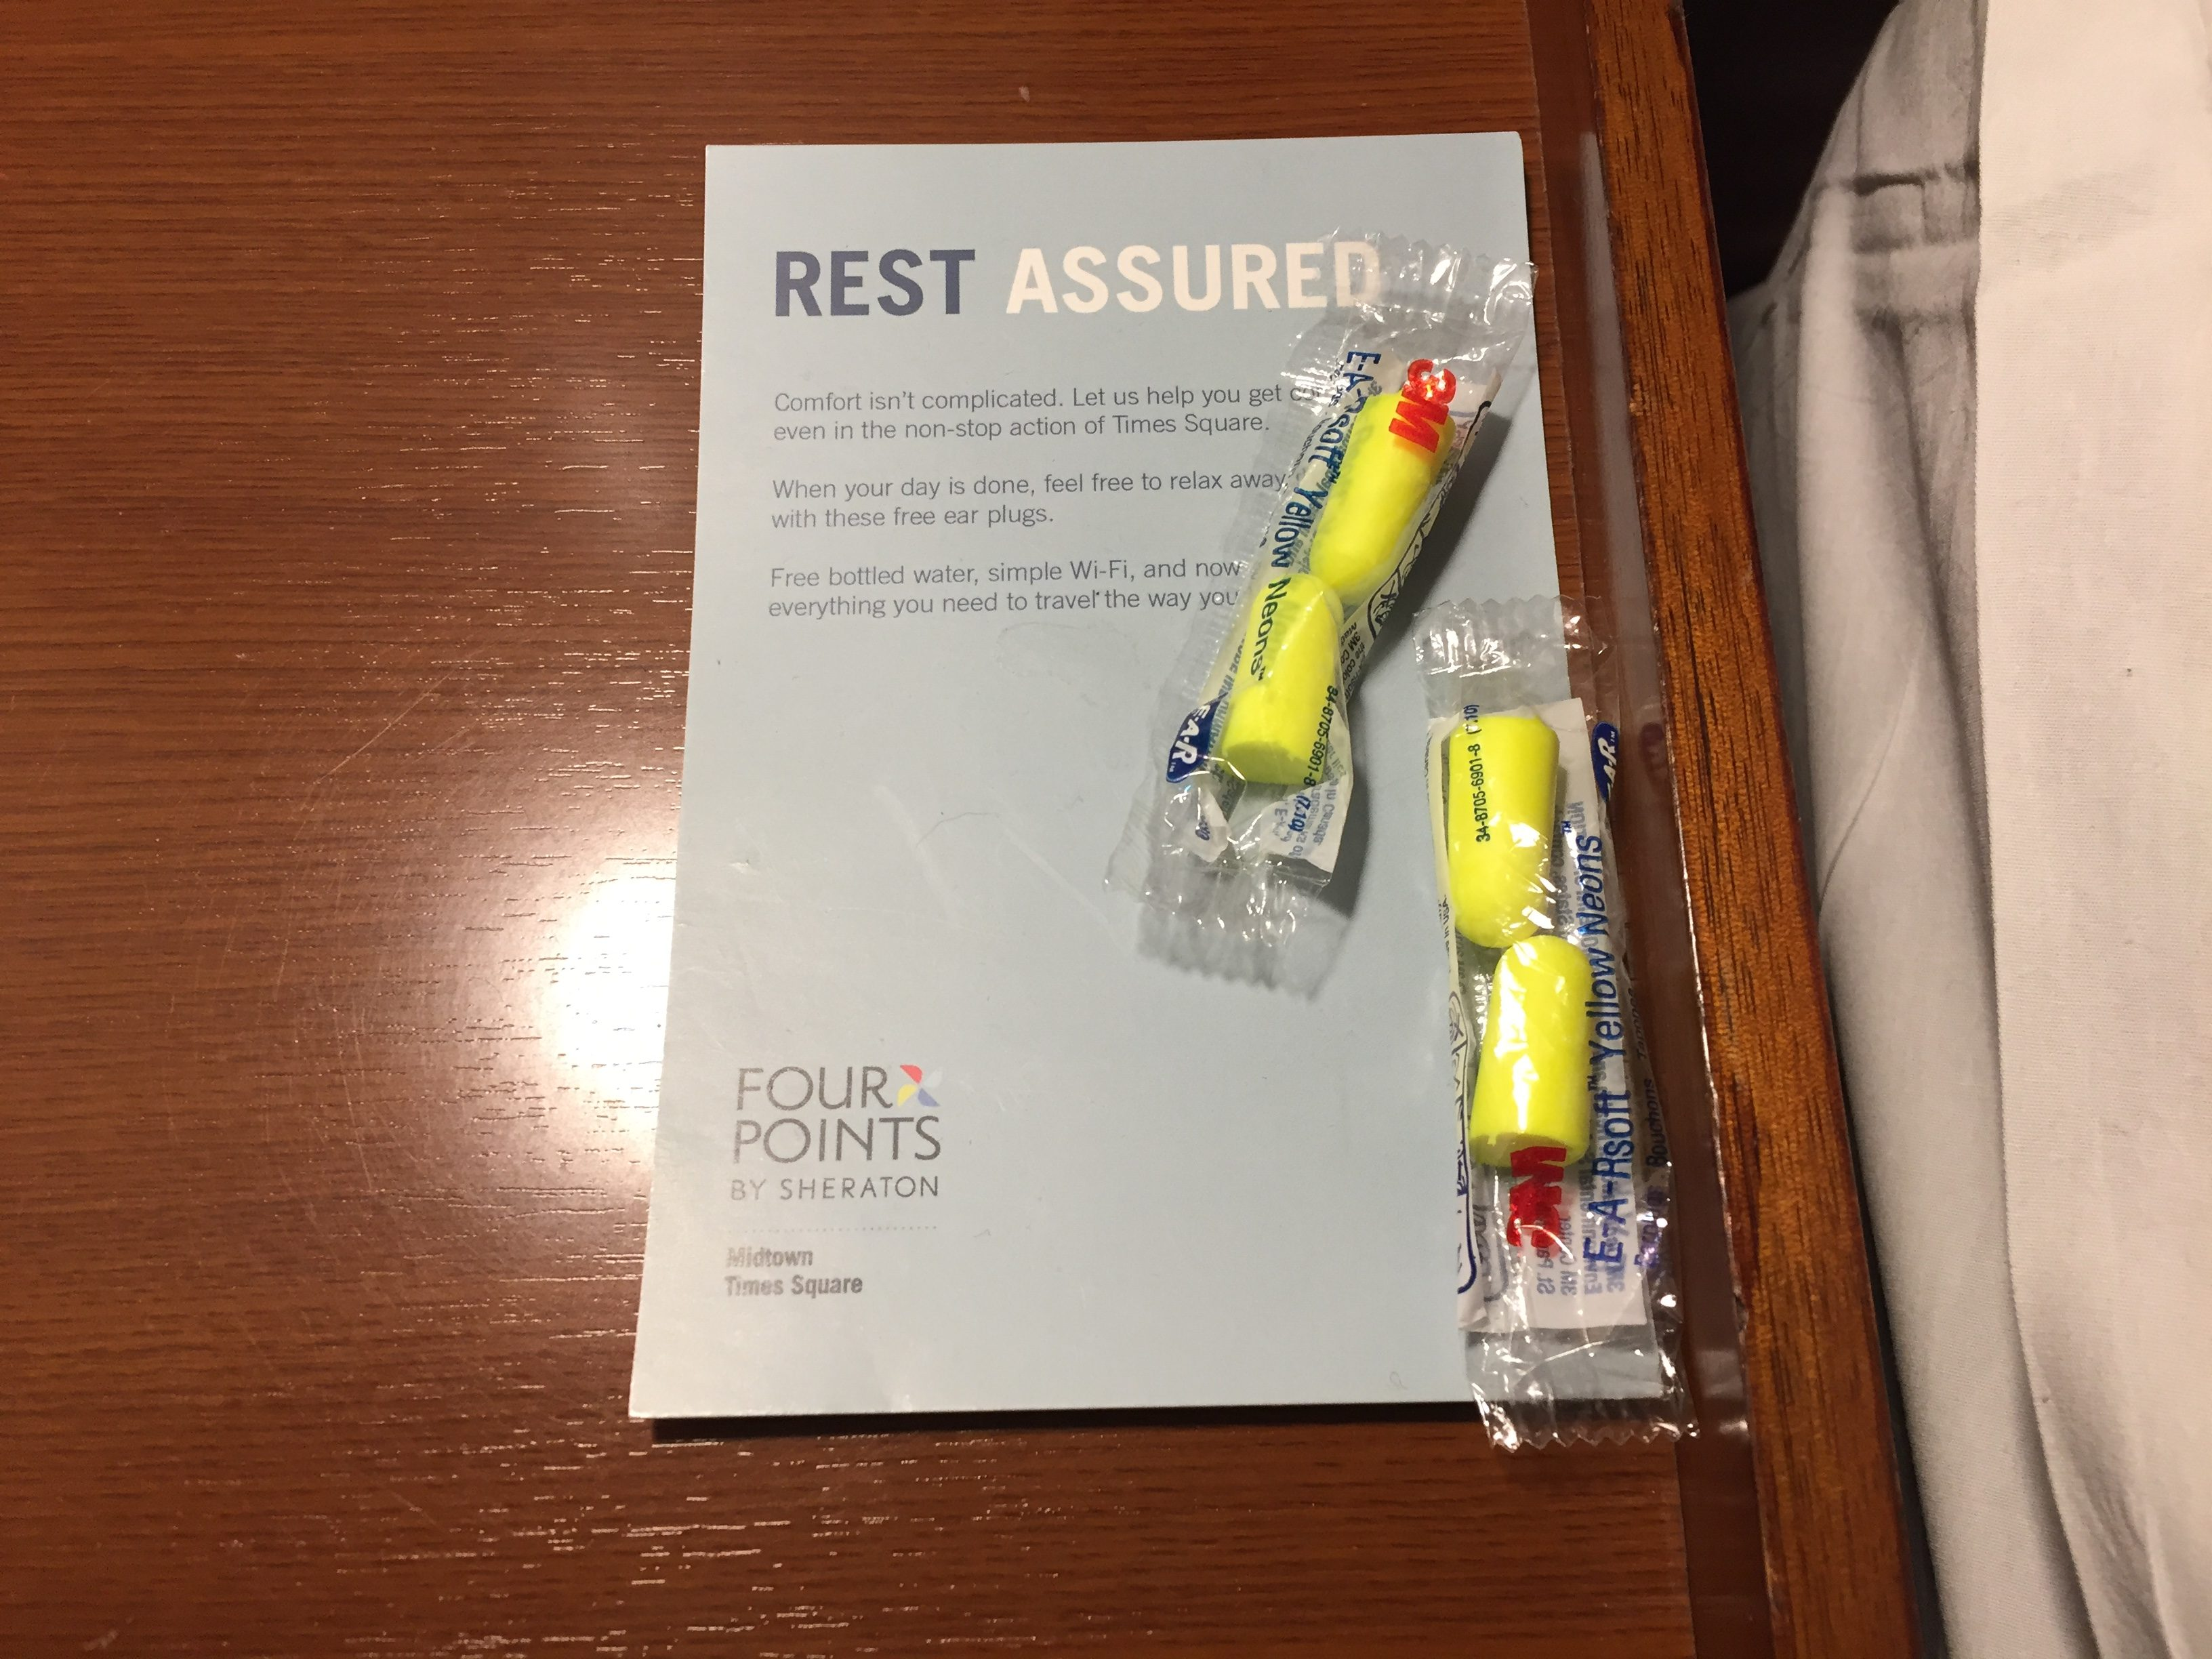 IMG 35451 e1517837660838 - El Hotel Four Points by Sheraton en Manhattan New York